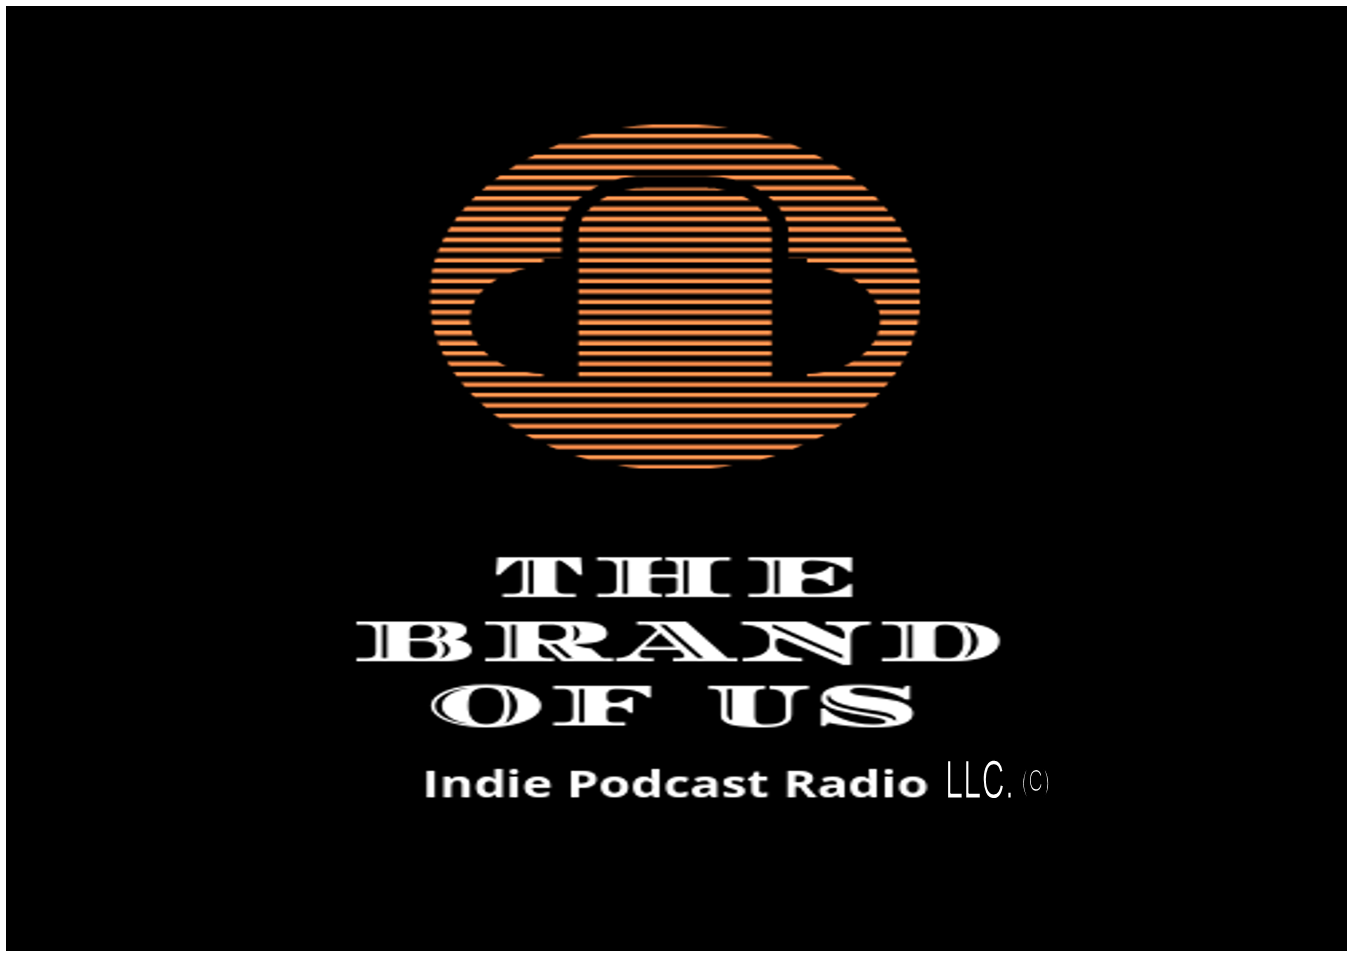 The Brand Of Us Podcast Radio Show logo